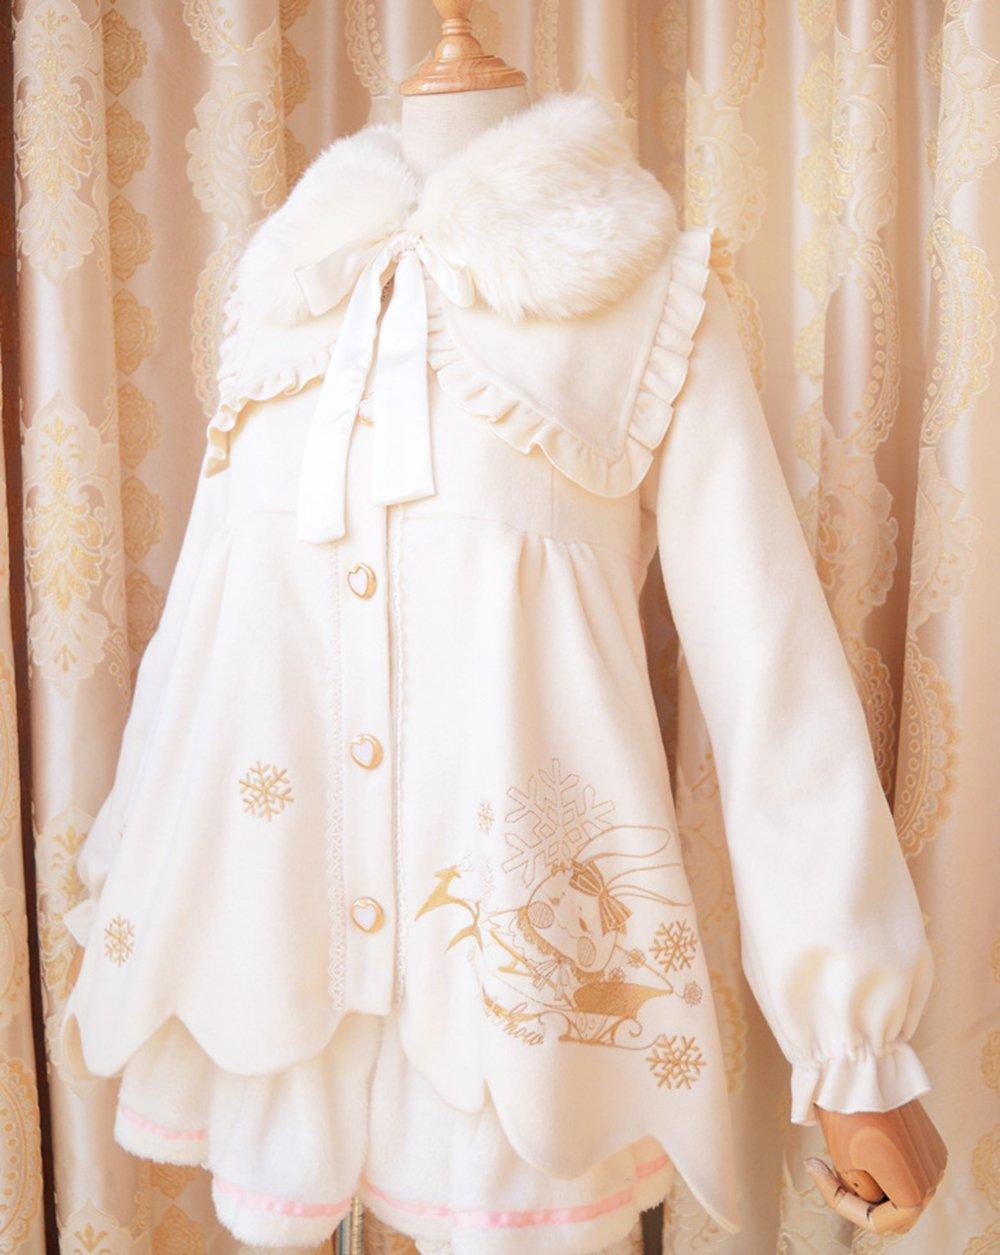 Nuoqi Winter Lolita Coat Womens Girls Cosplay Coat Costumes by Nuoqi (Image #2)